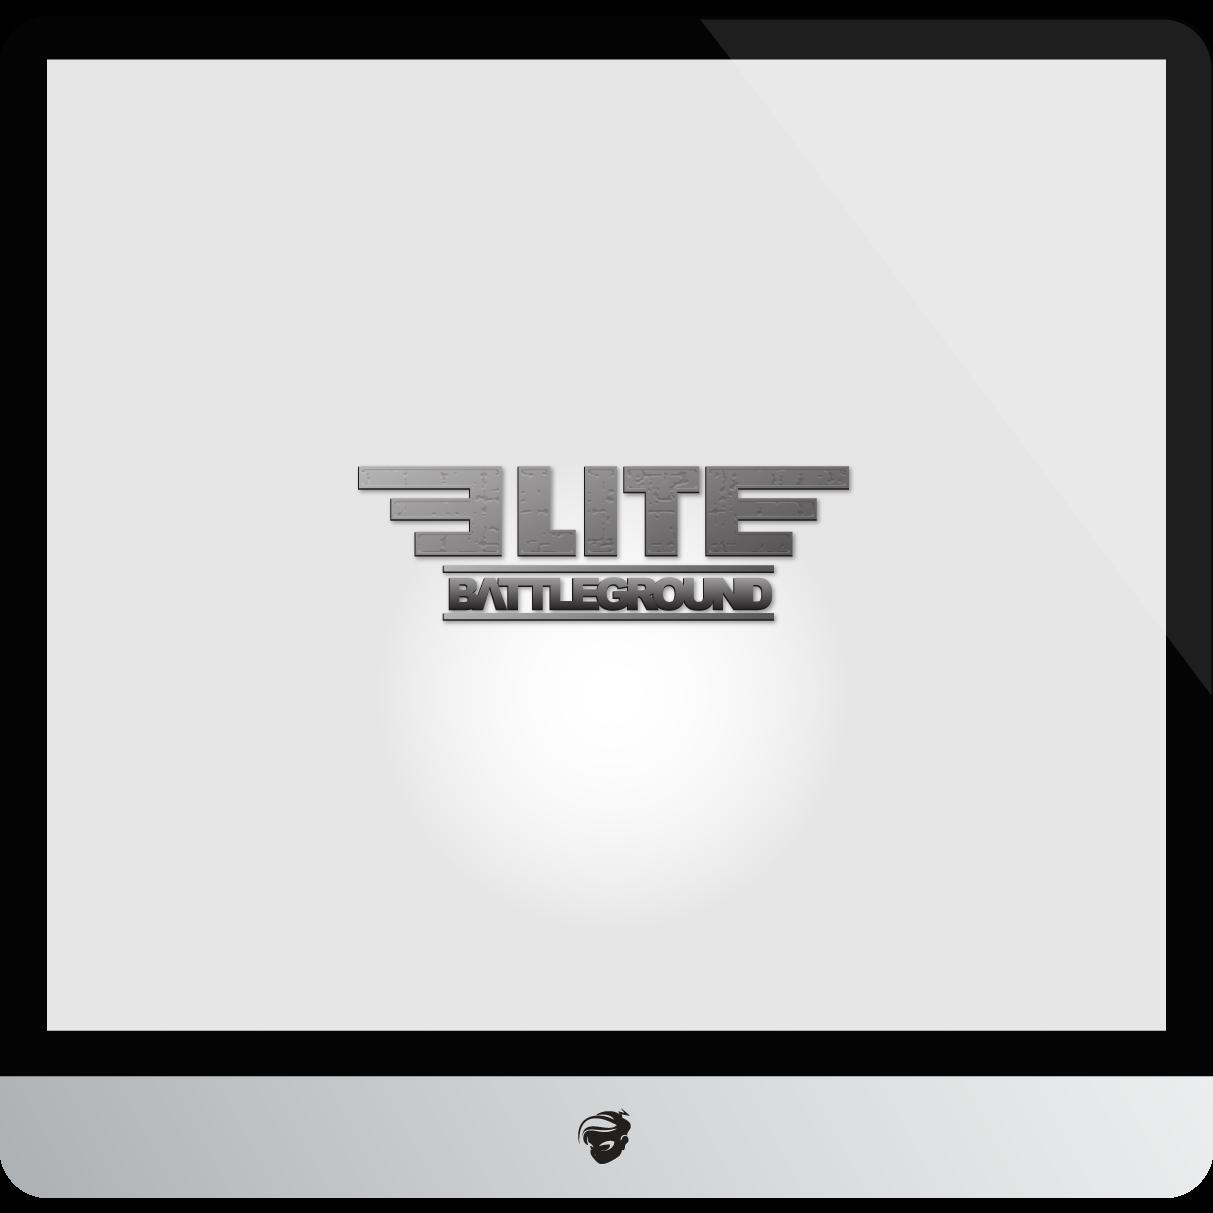 Logo Design by zesthar - Entry No. 104 in the Logo Design Contest Creative Logo Design for Elite Battlegrounds.